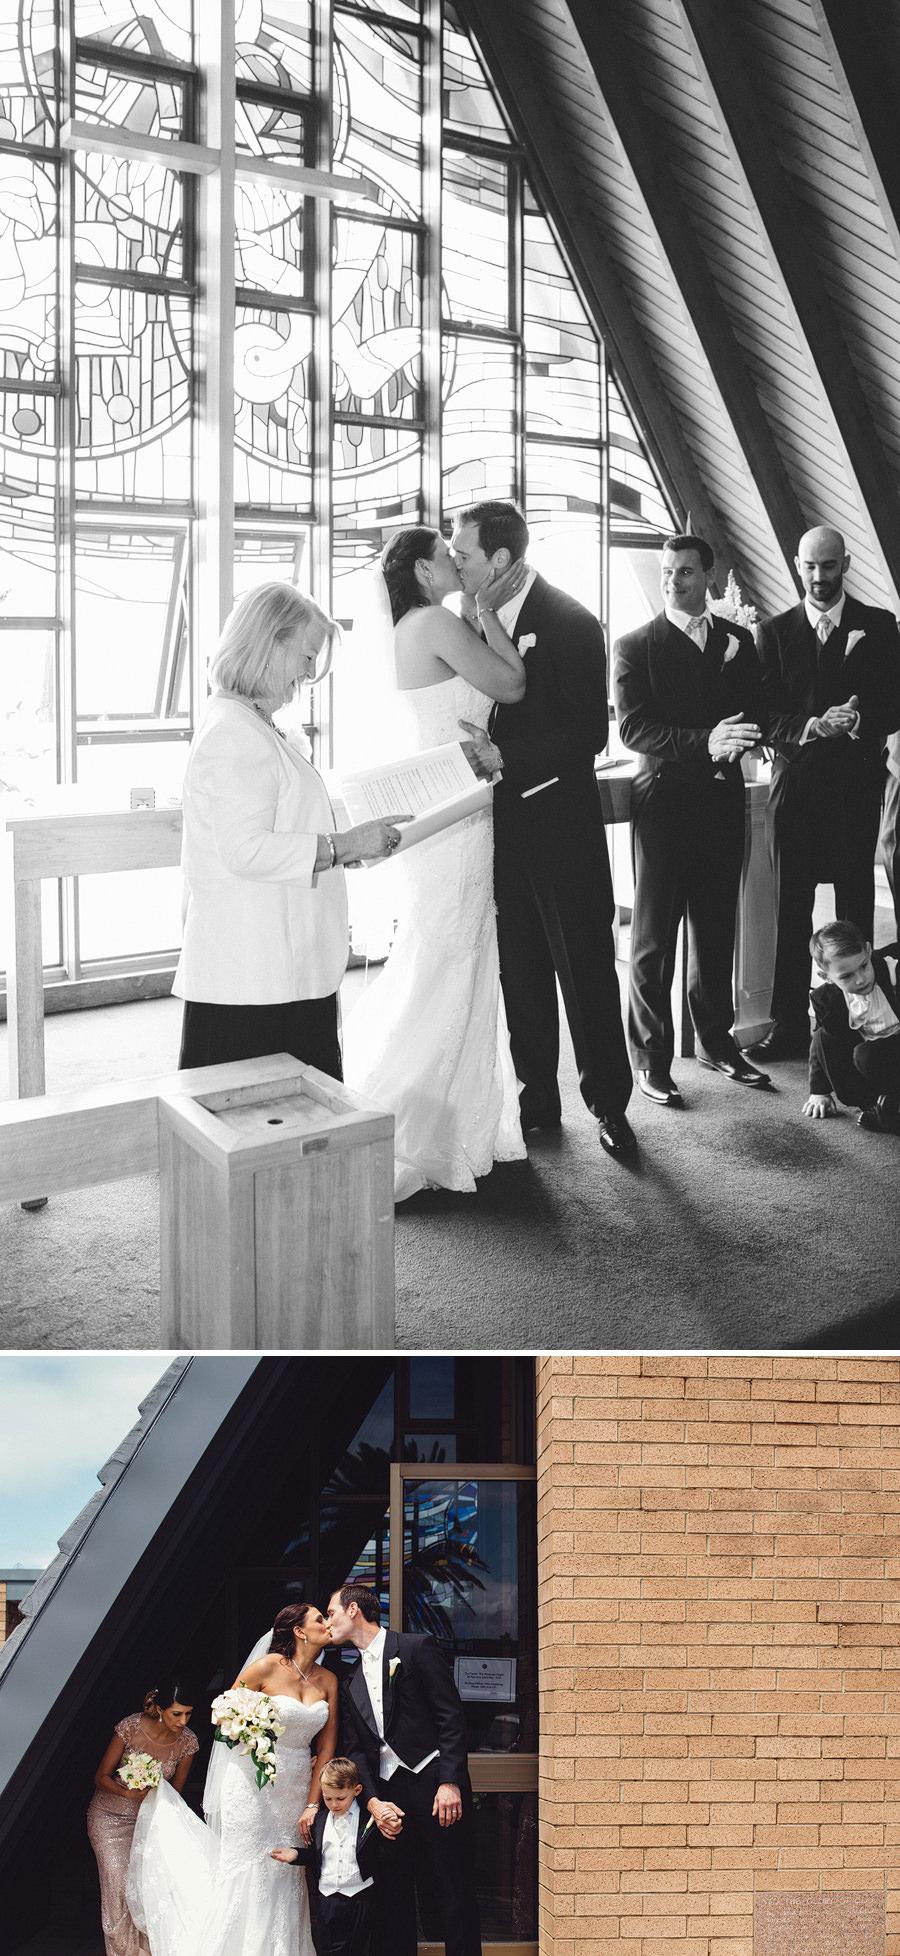 Candid Wedding Photographers: Ceremony